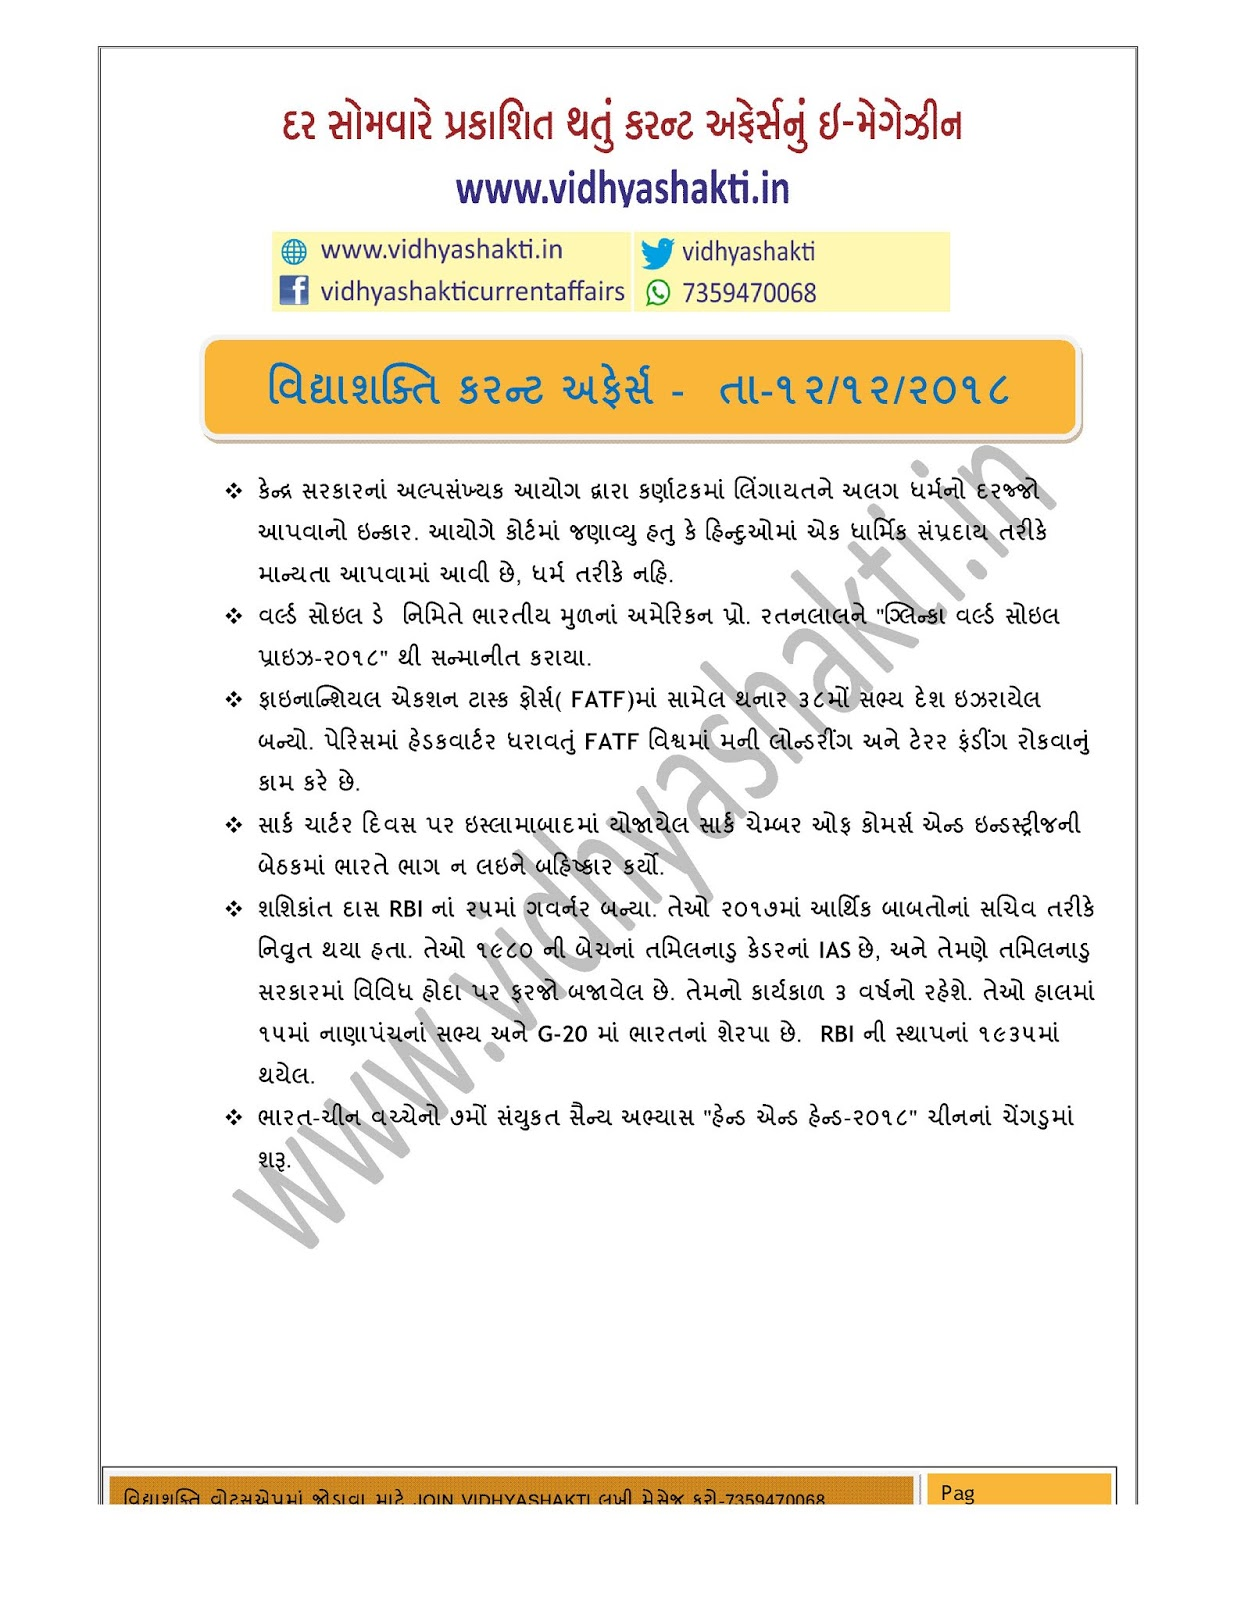 Daily Gujarati current Affairs vidhyashakti 2018